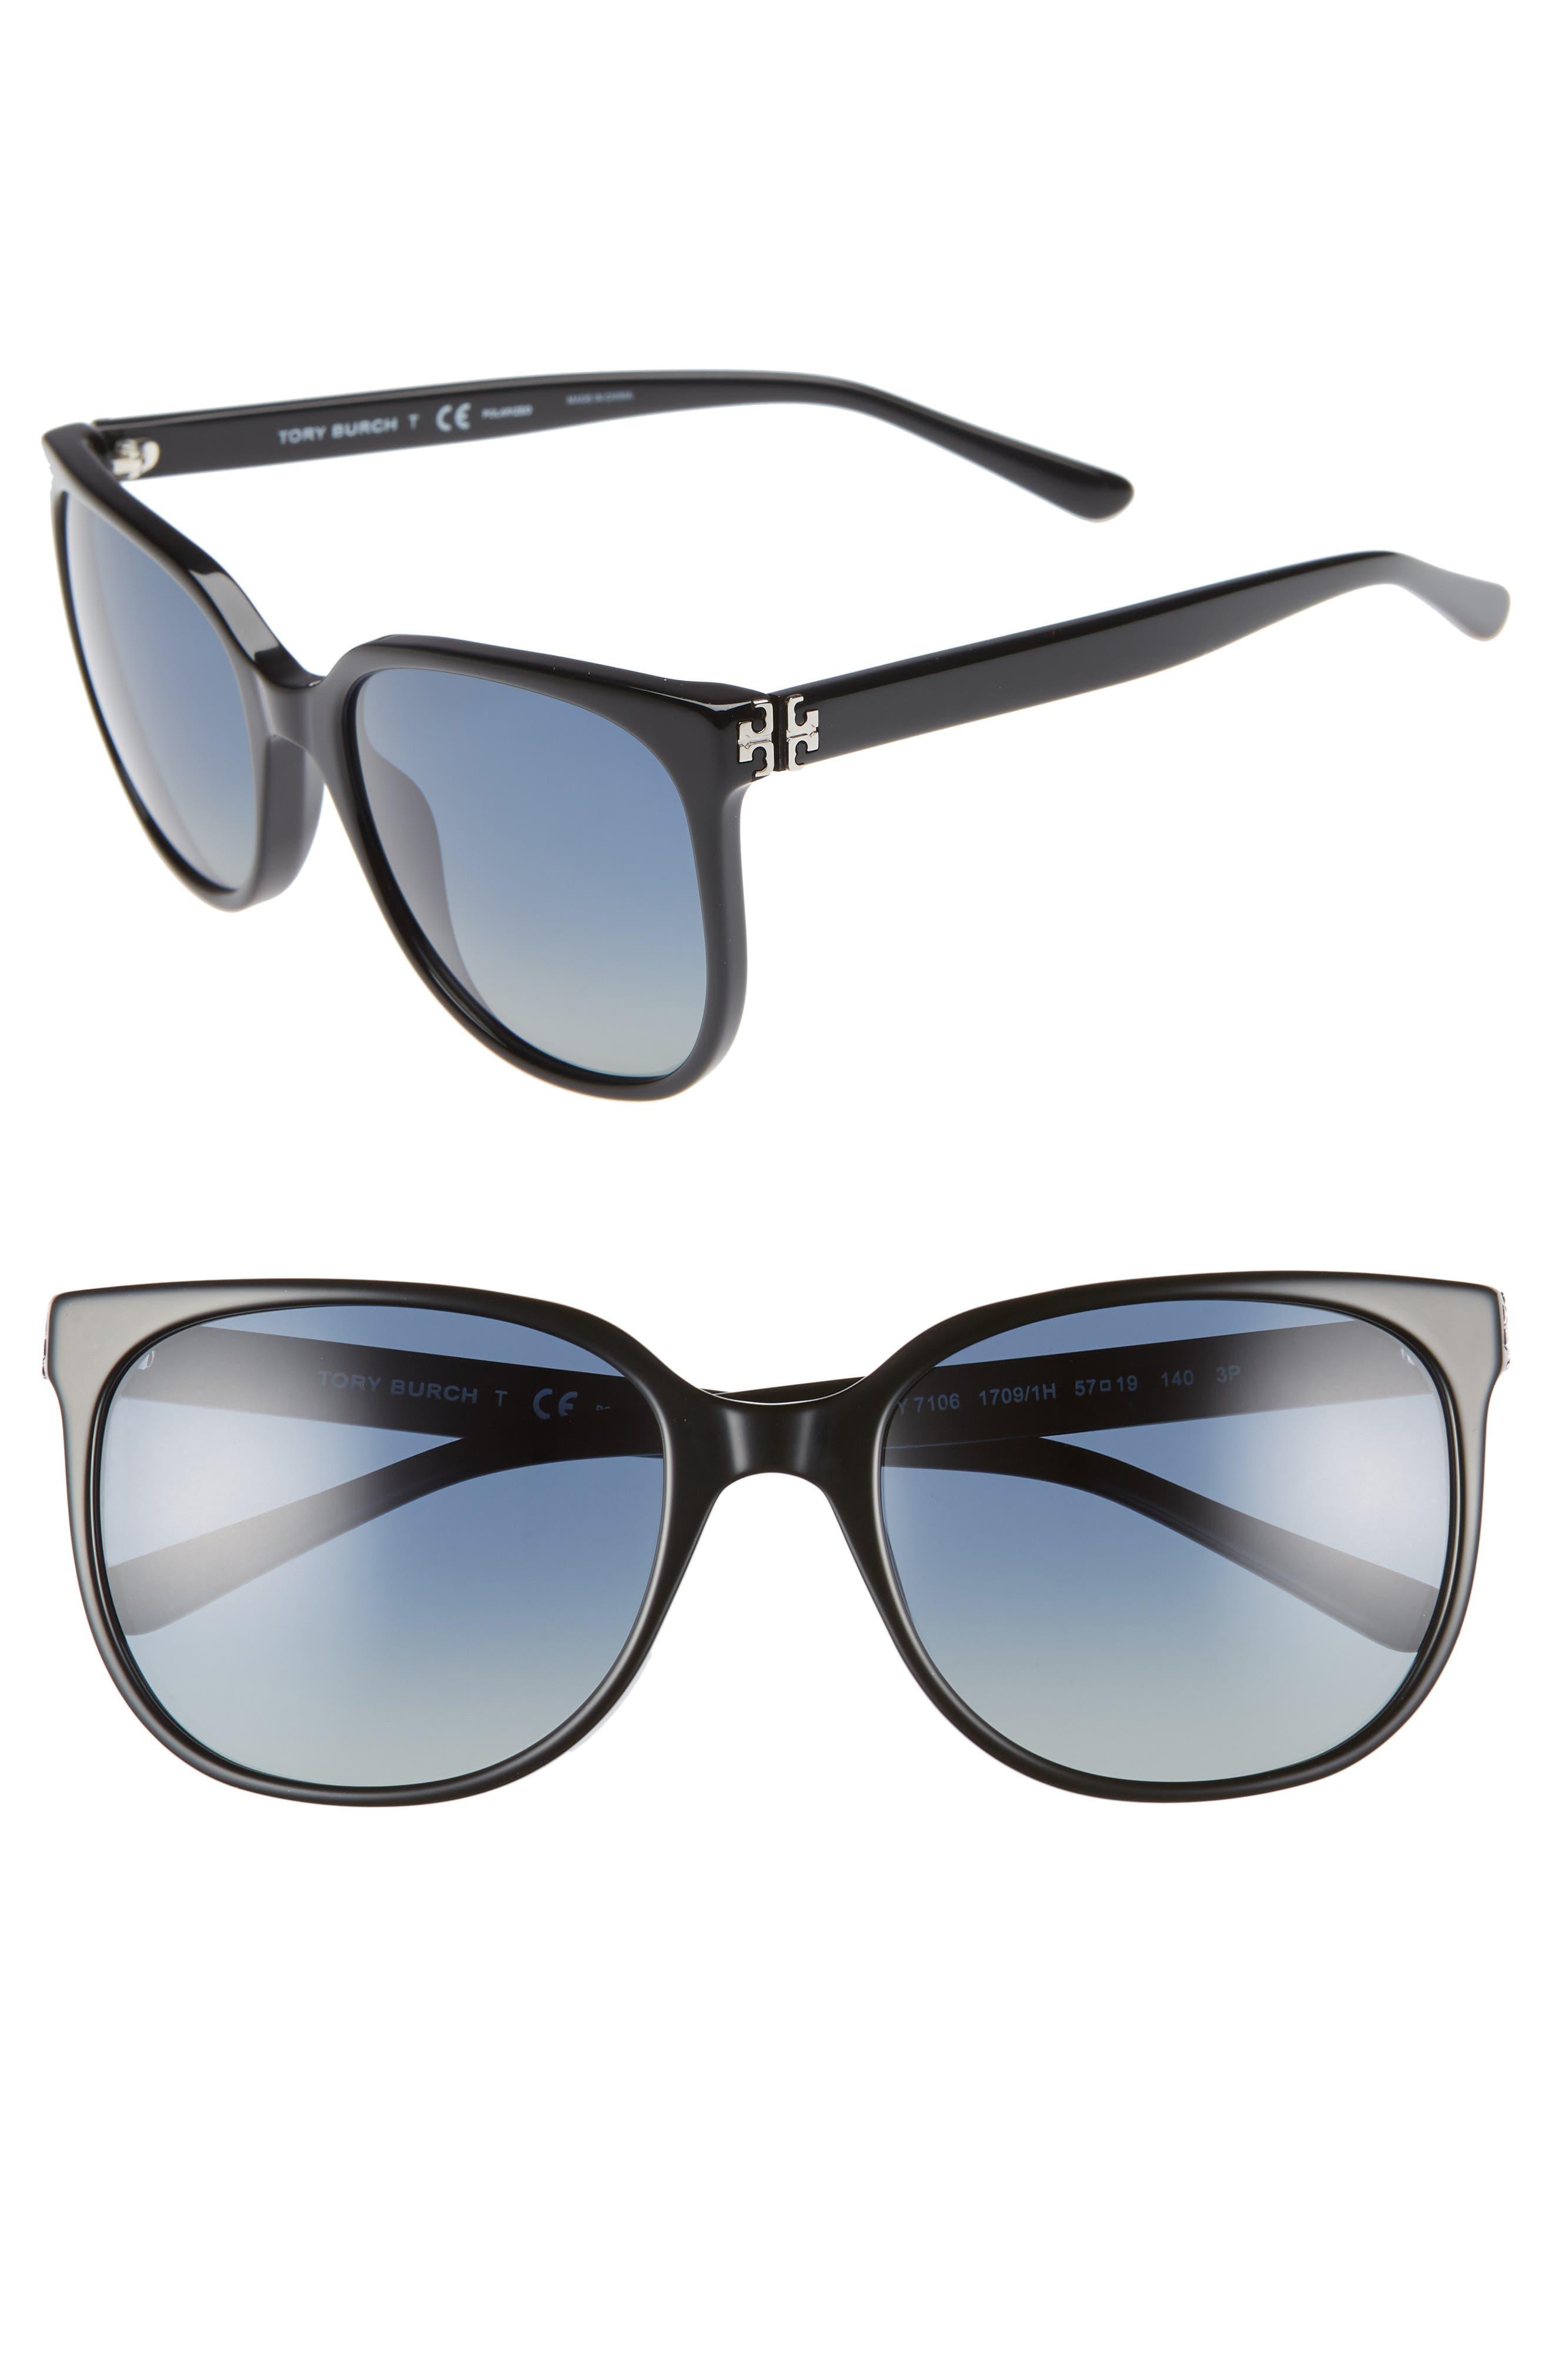 TORY BURCH, Revo 57mm Polarized Square Sunglasses, Main thumbnail 1, color, 001